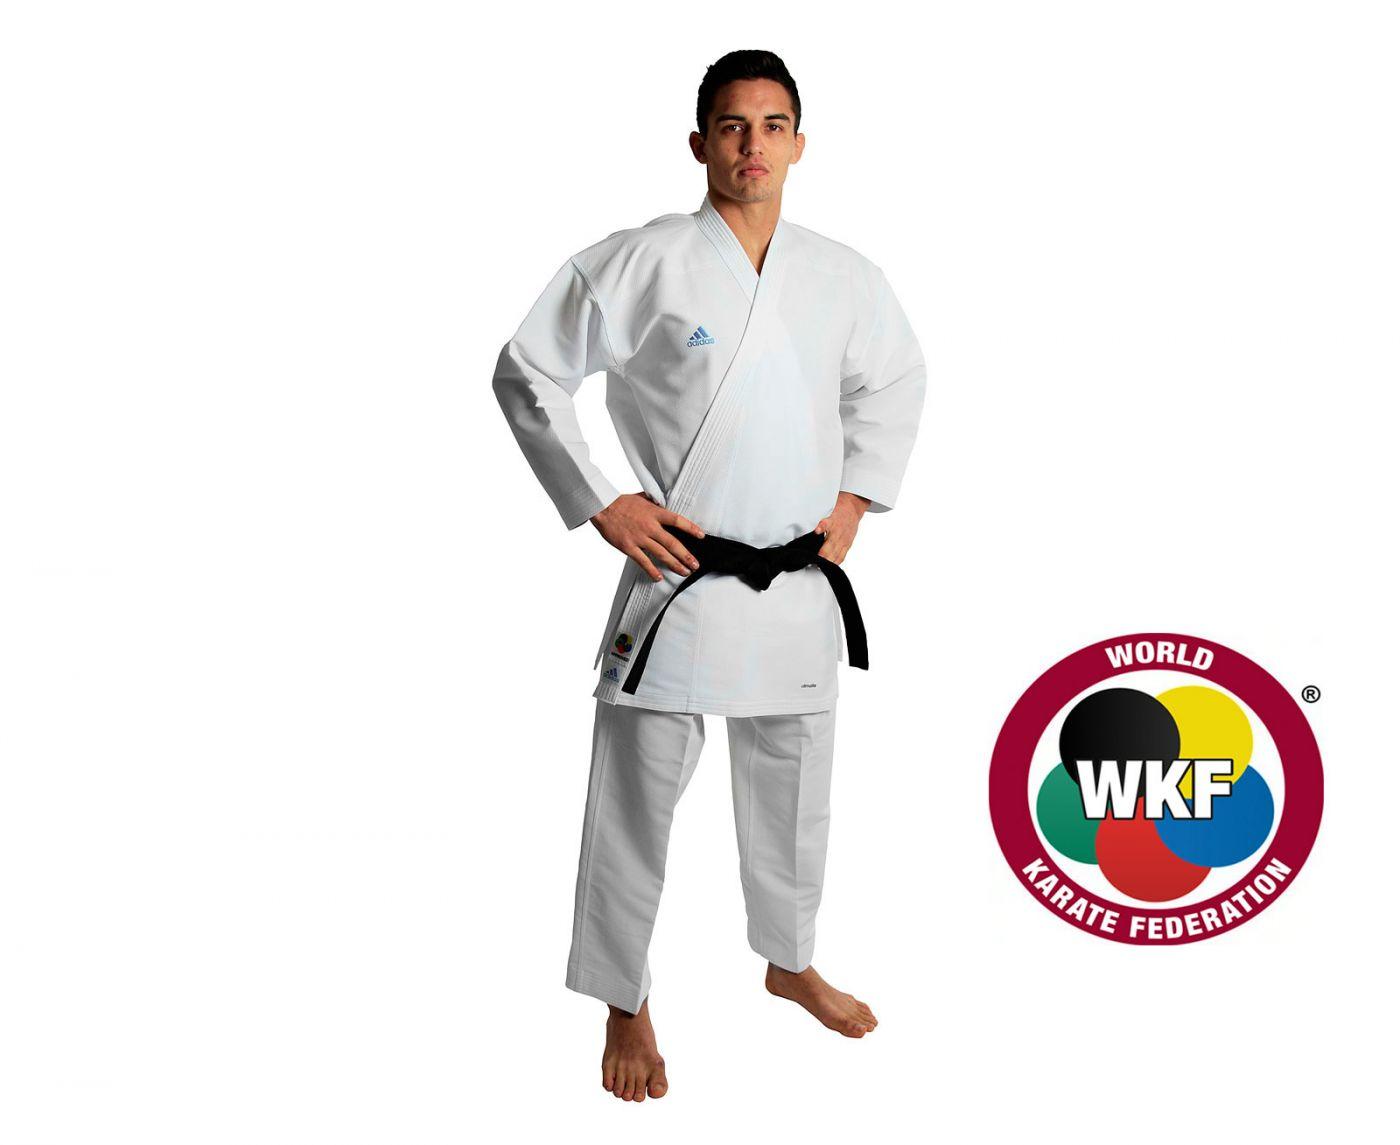 Кимоно для карате Adidas Revo Flex Karate Gi WKF белое, размер 200 см, артикул K190SK